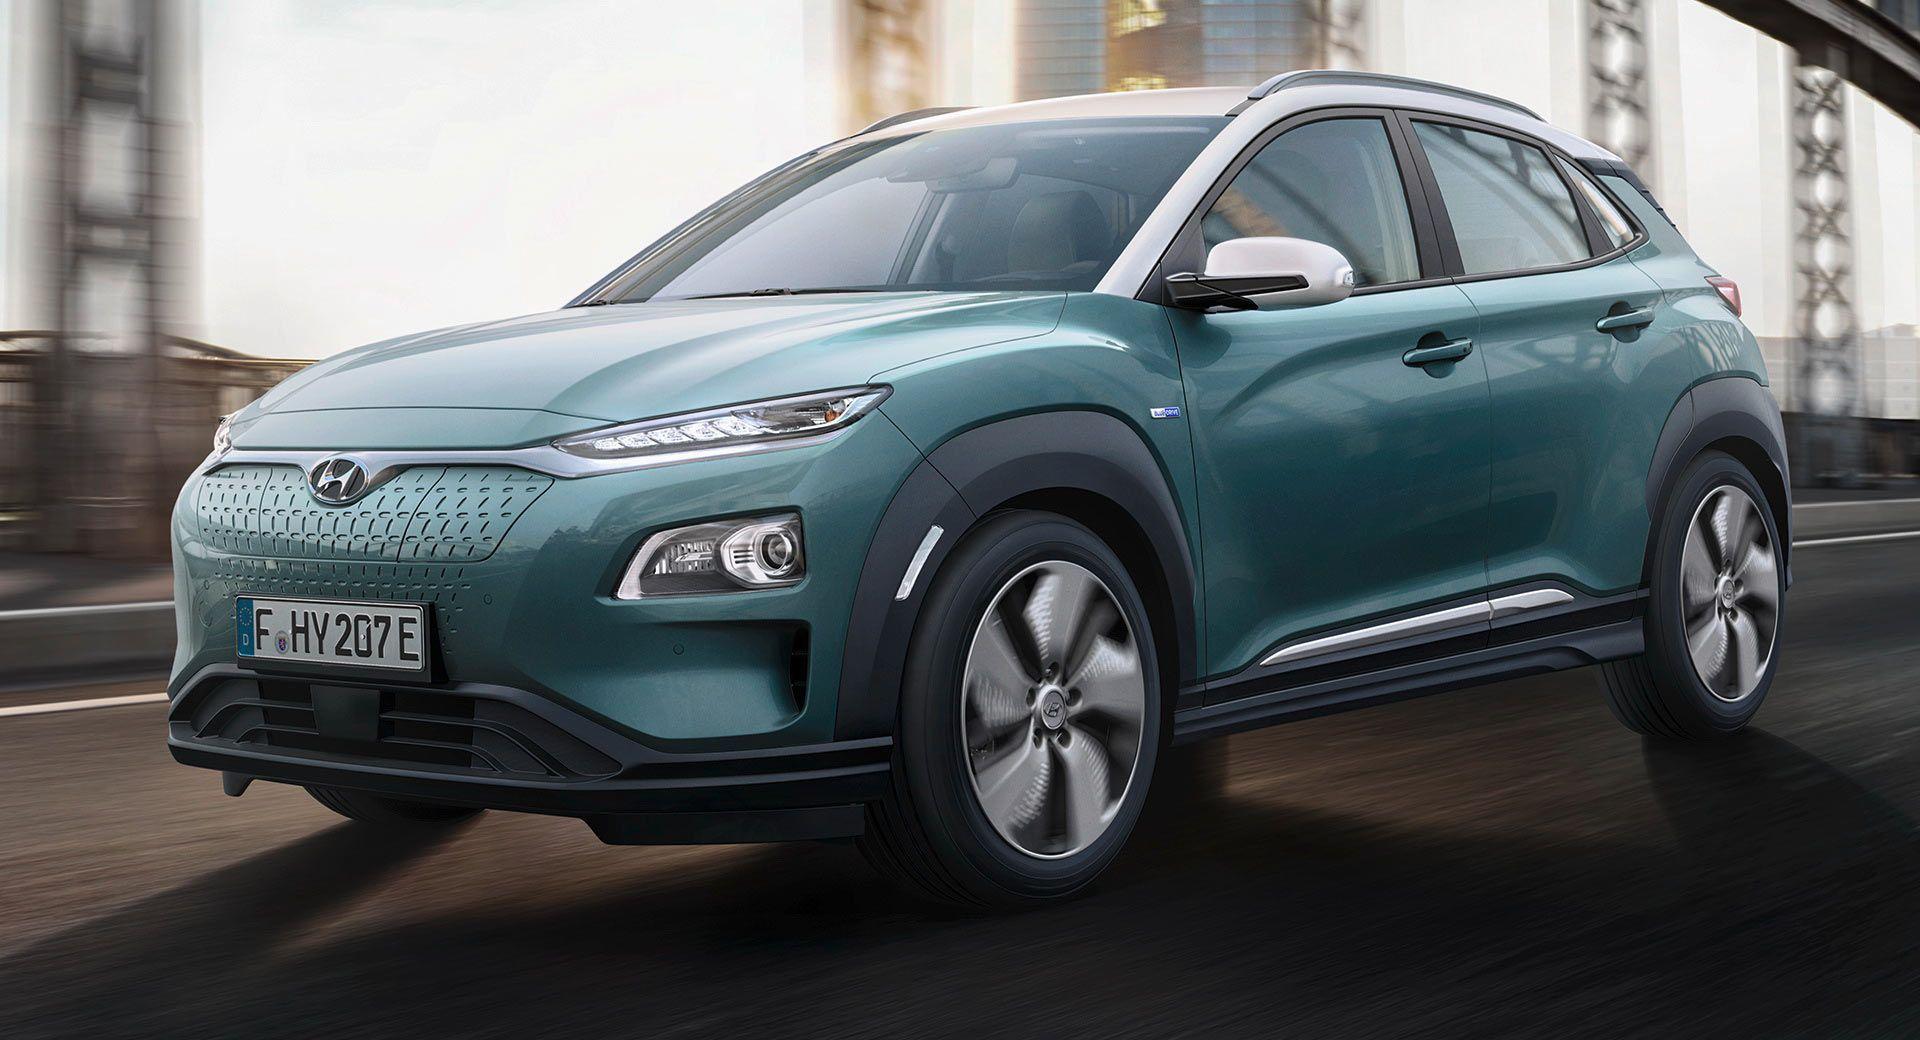 Hyundai Kona Electric Has 204 Horses And Up To 292 Miles Of Range Hyundai Electric Cars Electricity